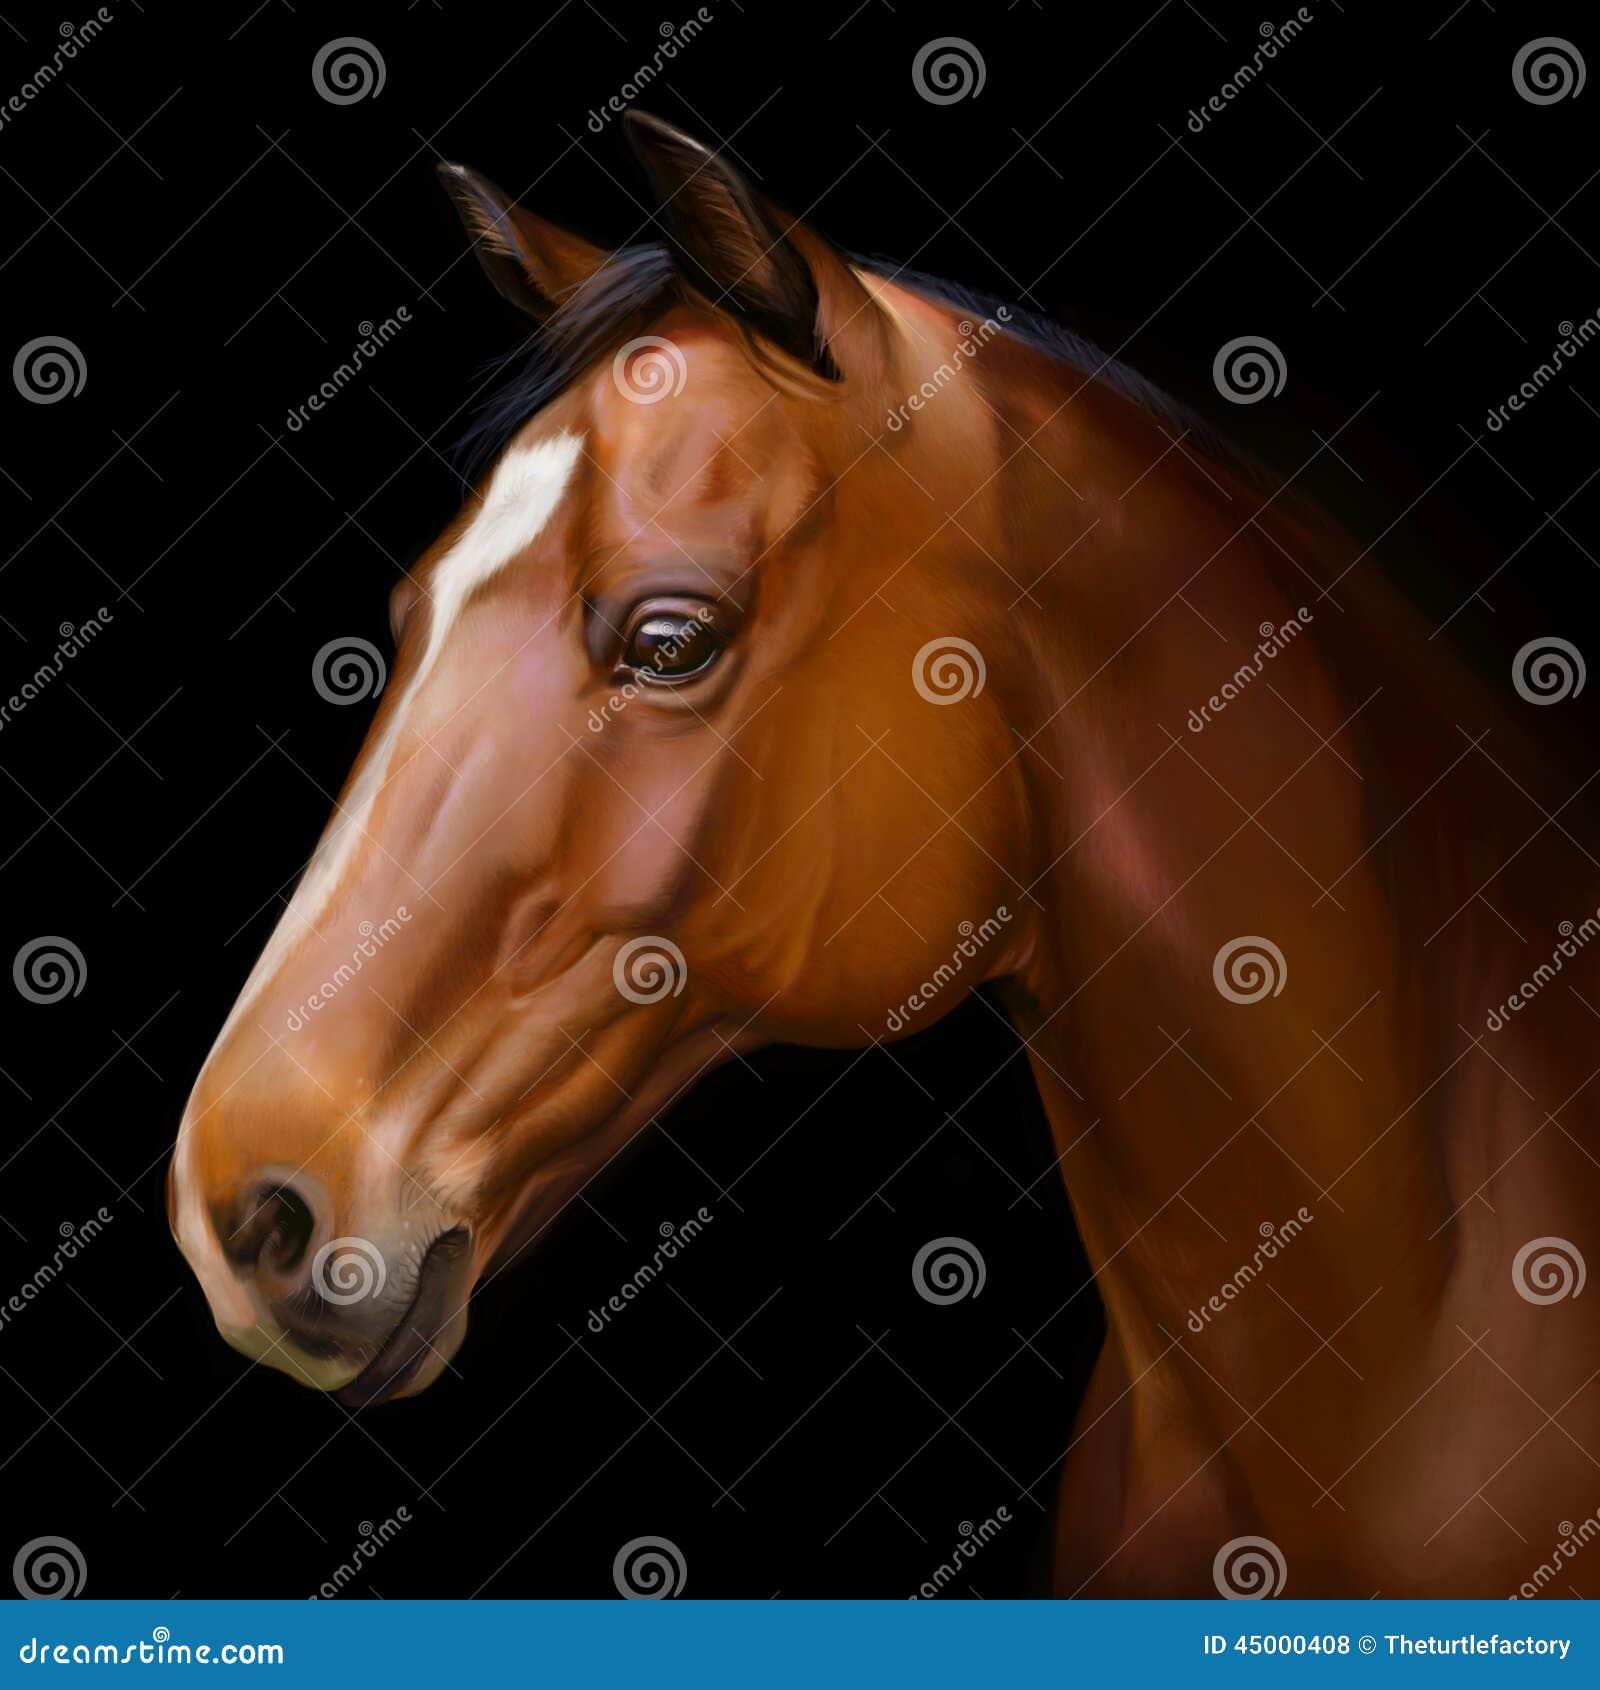 Hyper Realistic Digital Painting Of A Horses Head Stock Illustration Illustration Of Realism Mane 45000408